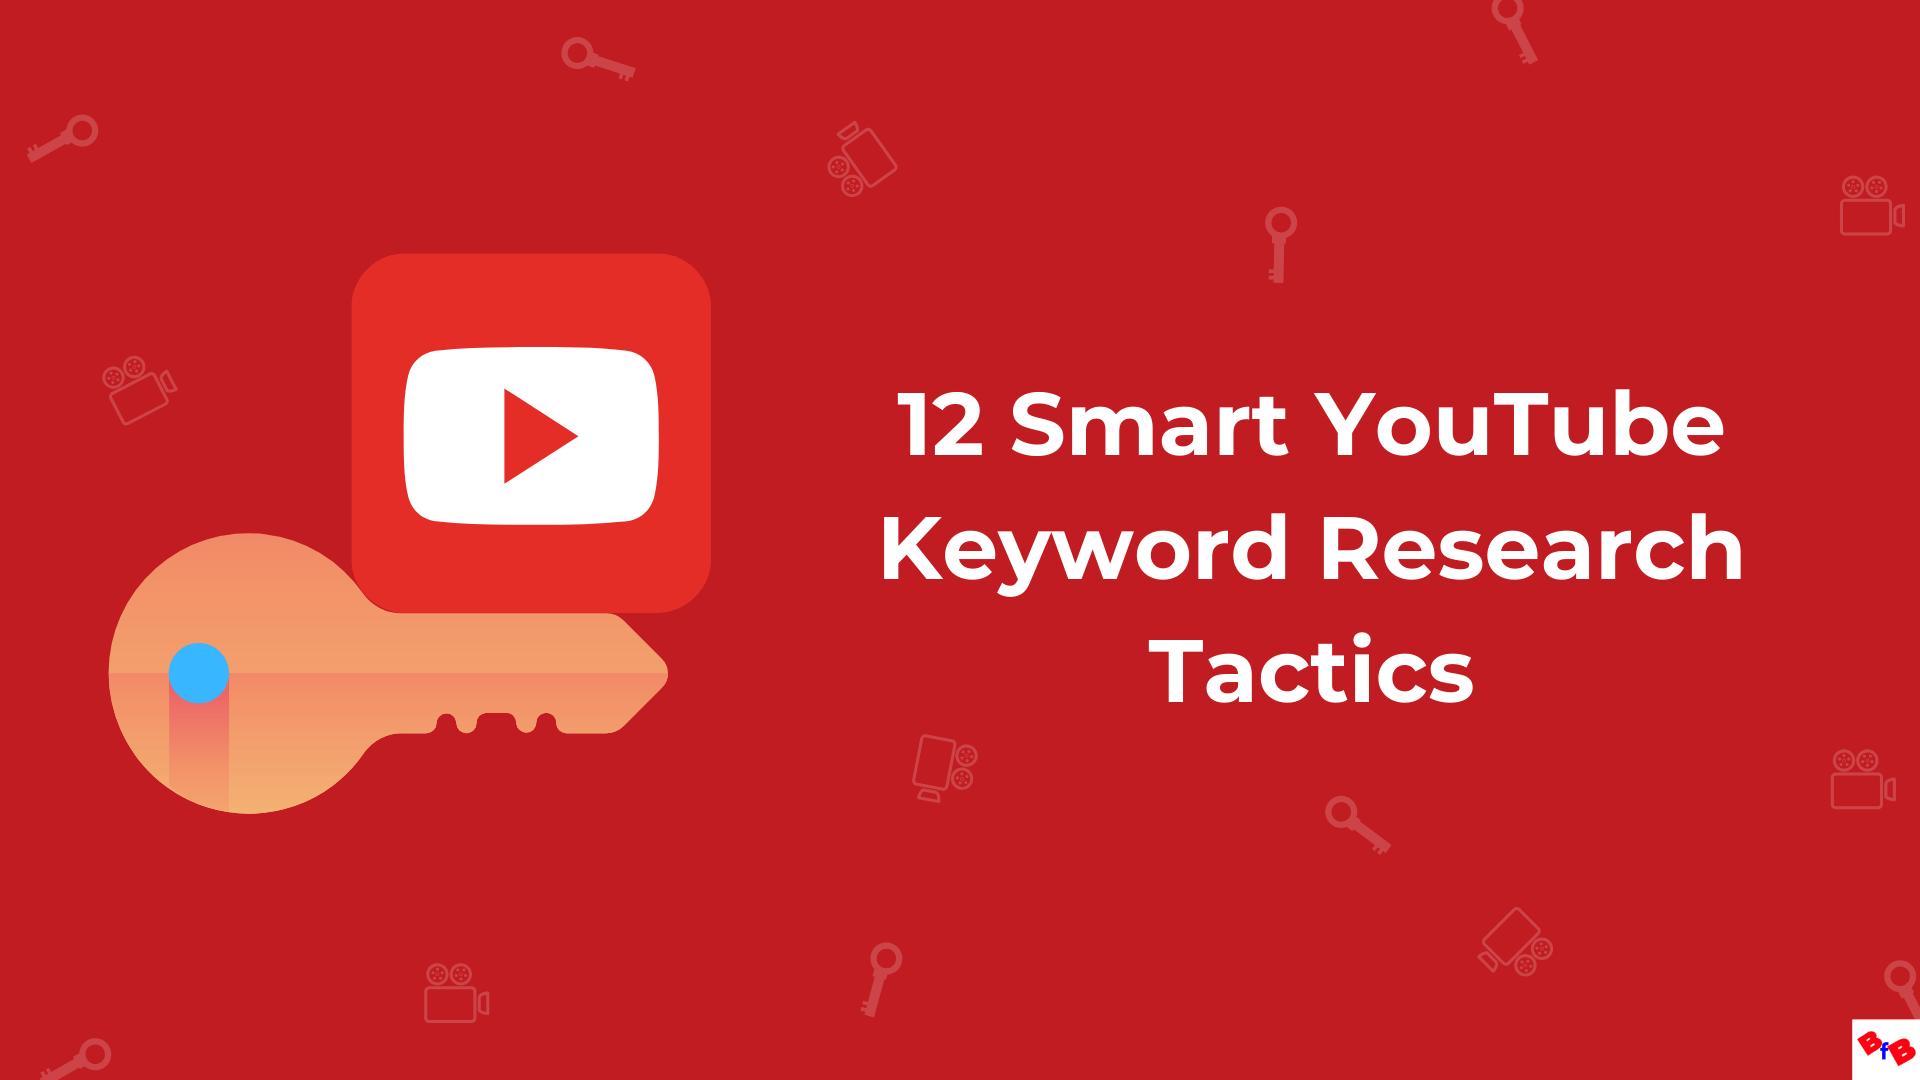 12-Smart-YouTube-Keyword-Research-ideas